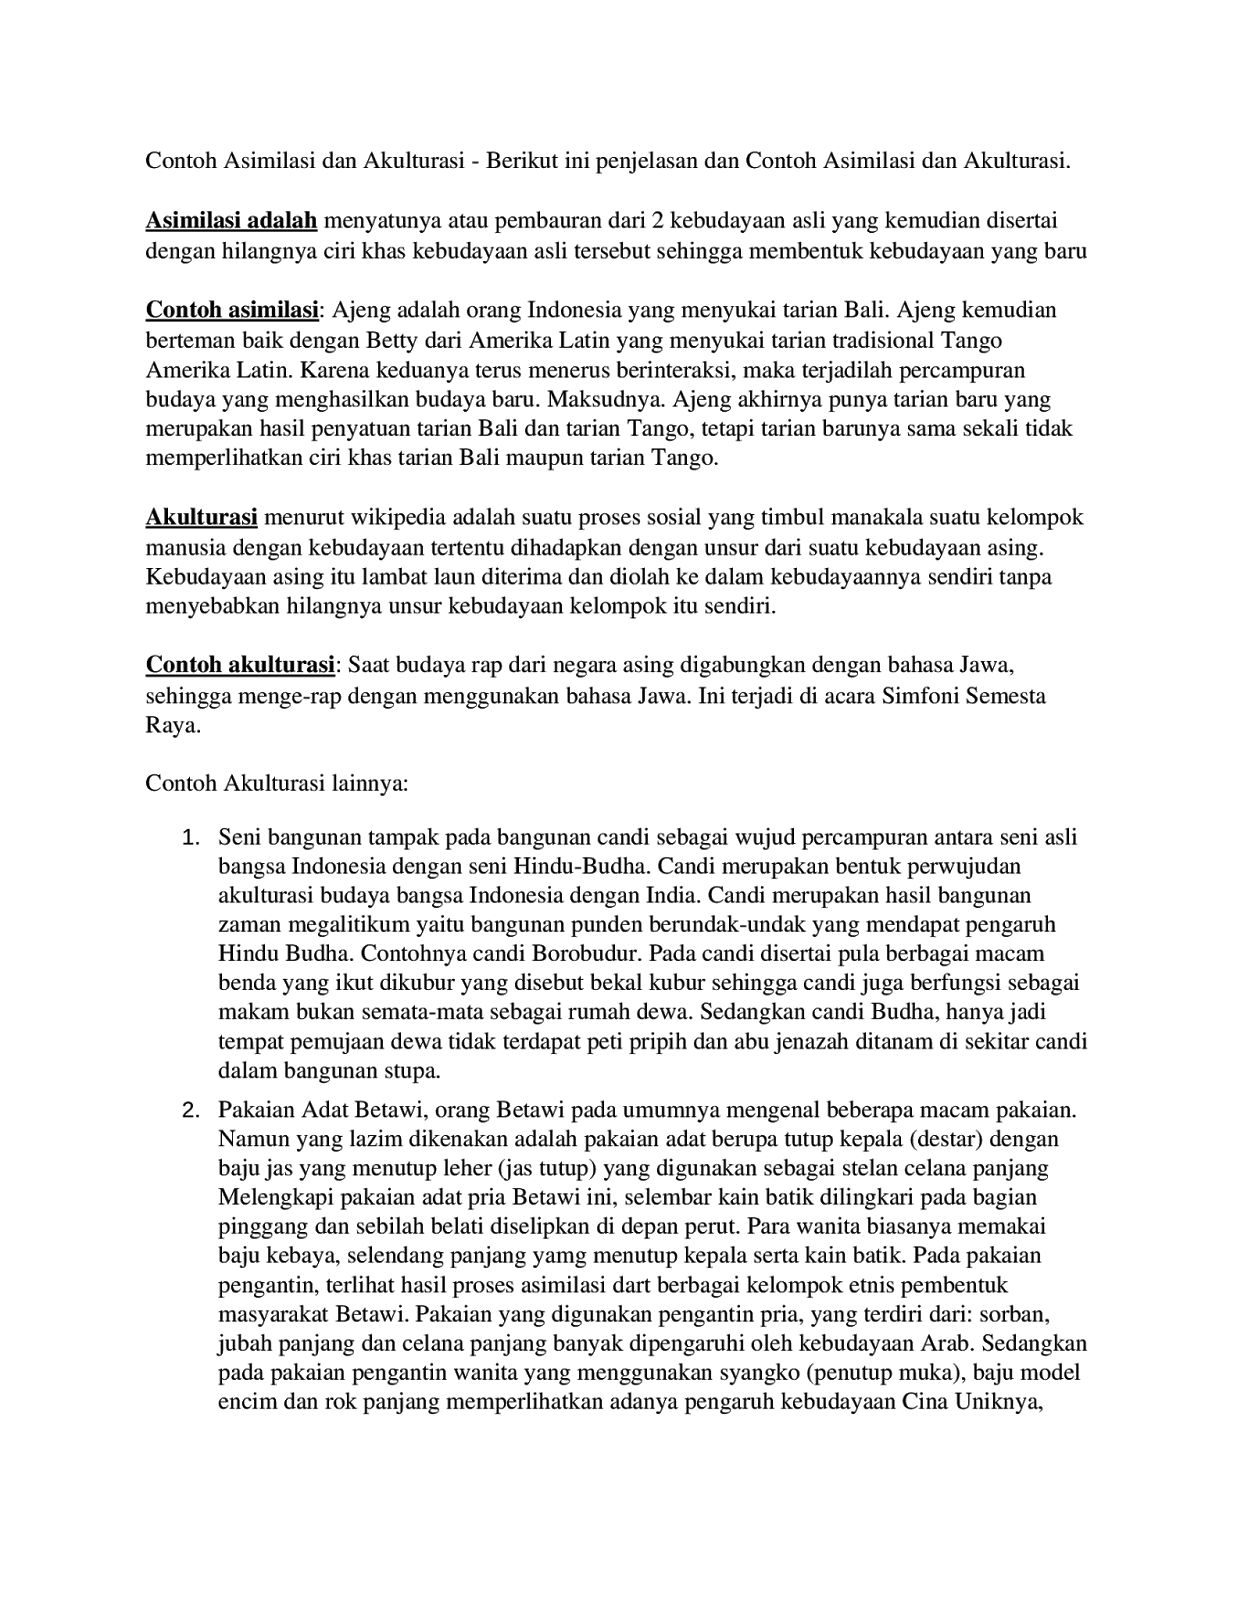 Contoh Asimilasi Wood Scribd Indo